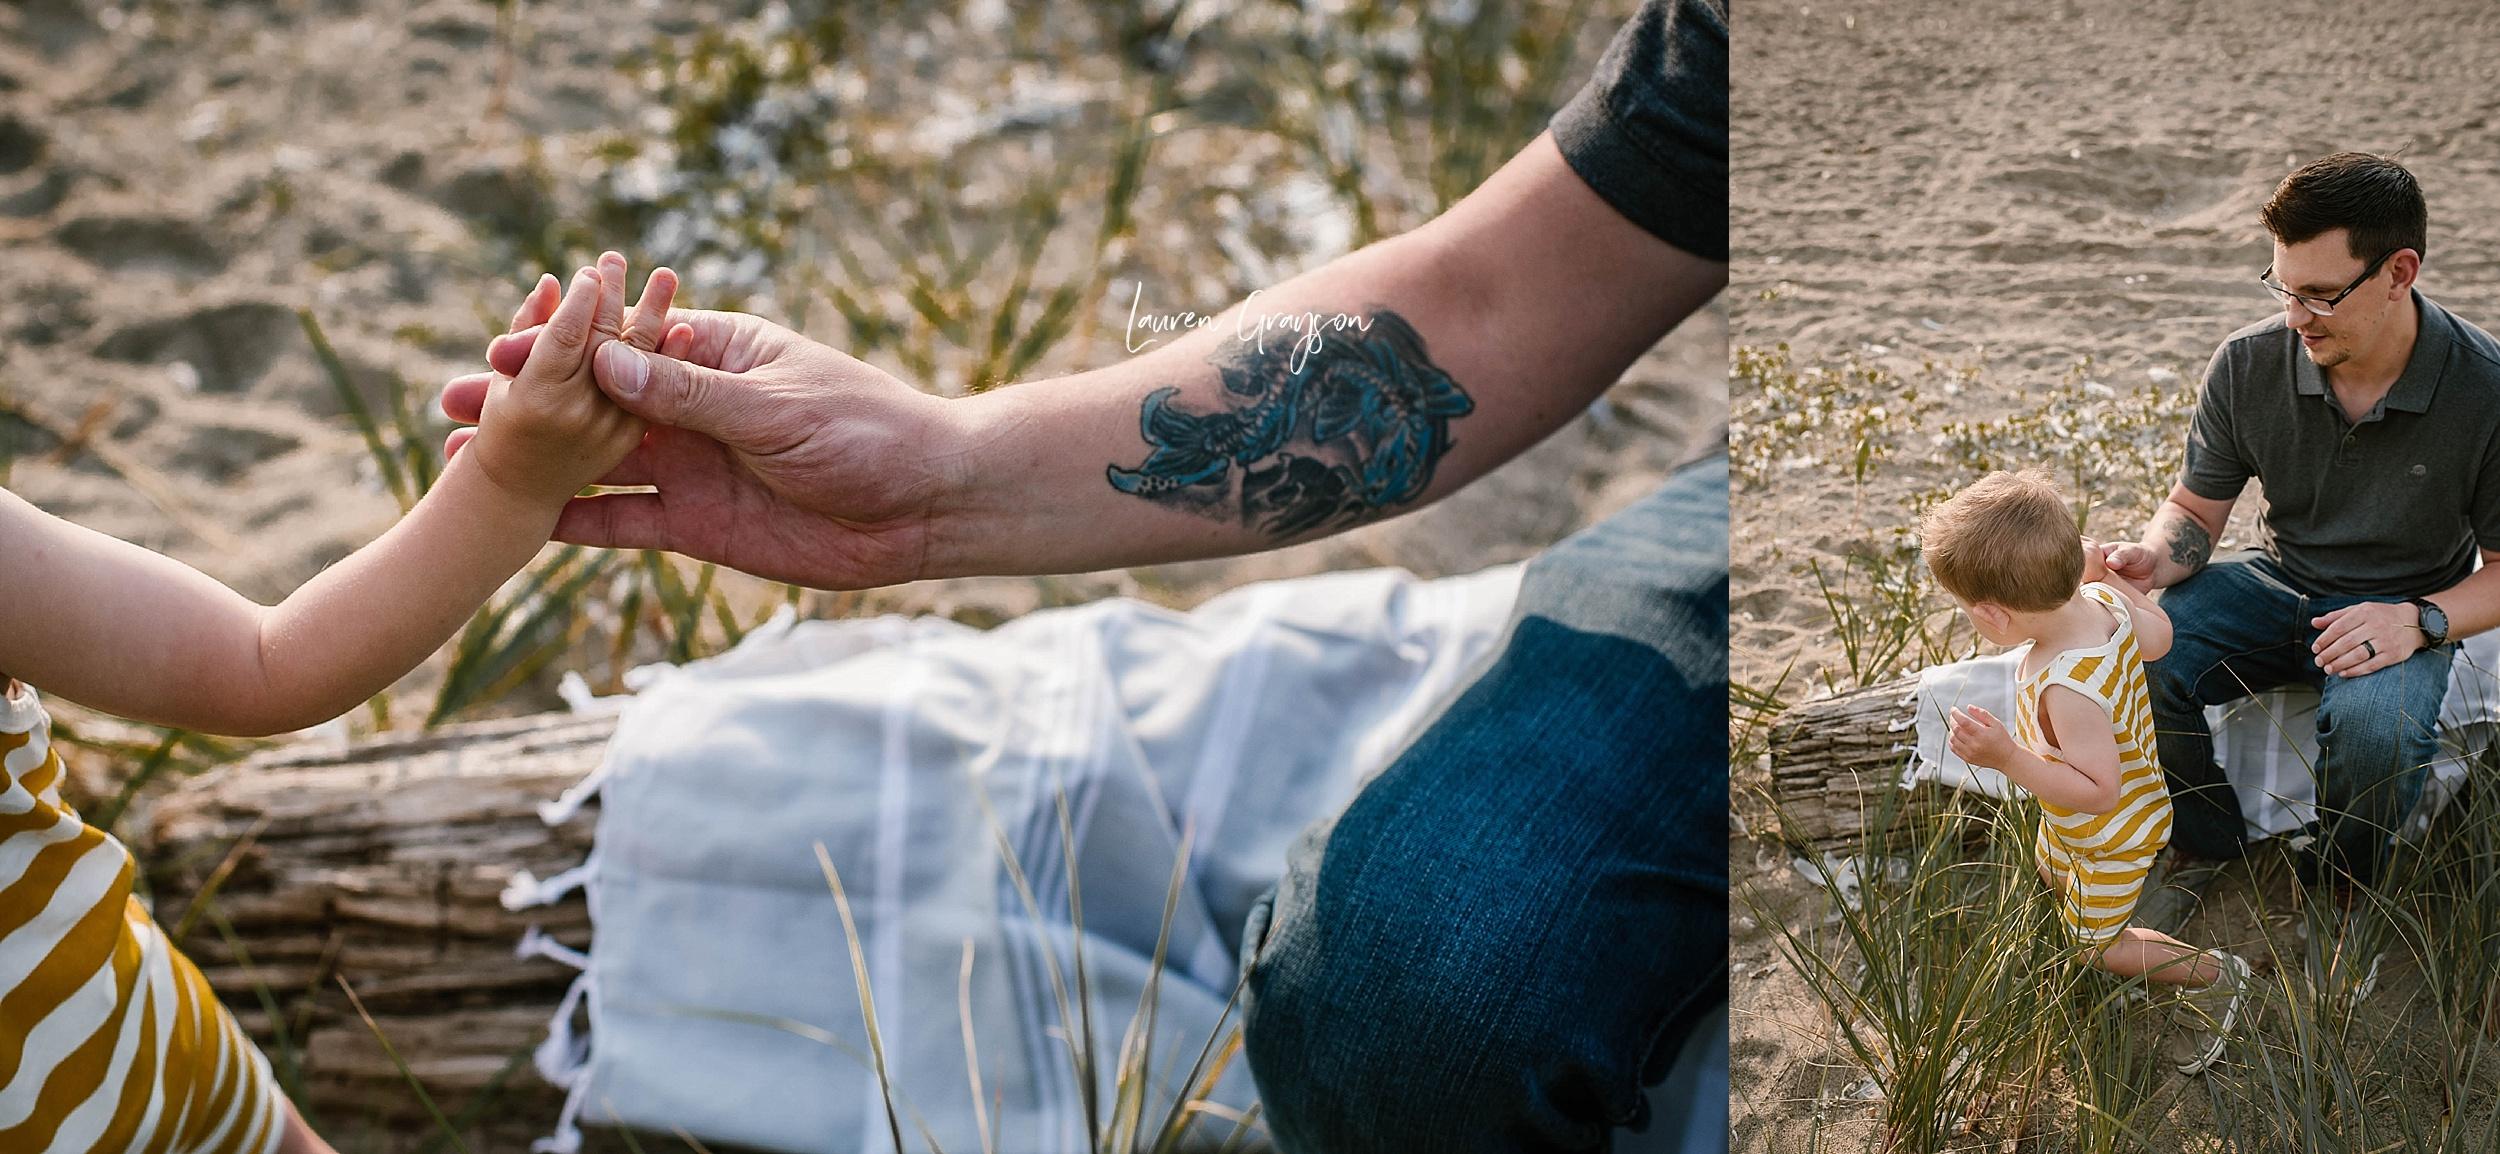 lauren-grayson-photography-cleveland-ohio-photographer-mentor-headlands-beach-maternity-session-2018_0756.jpg